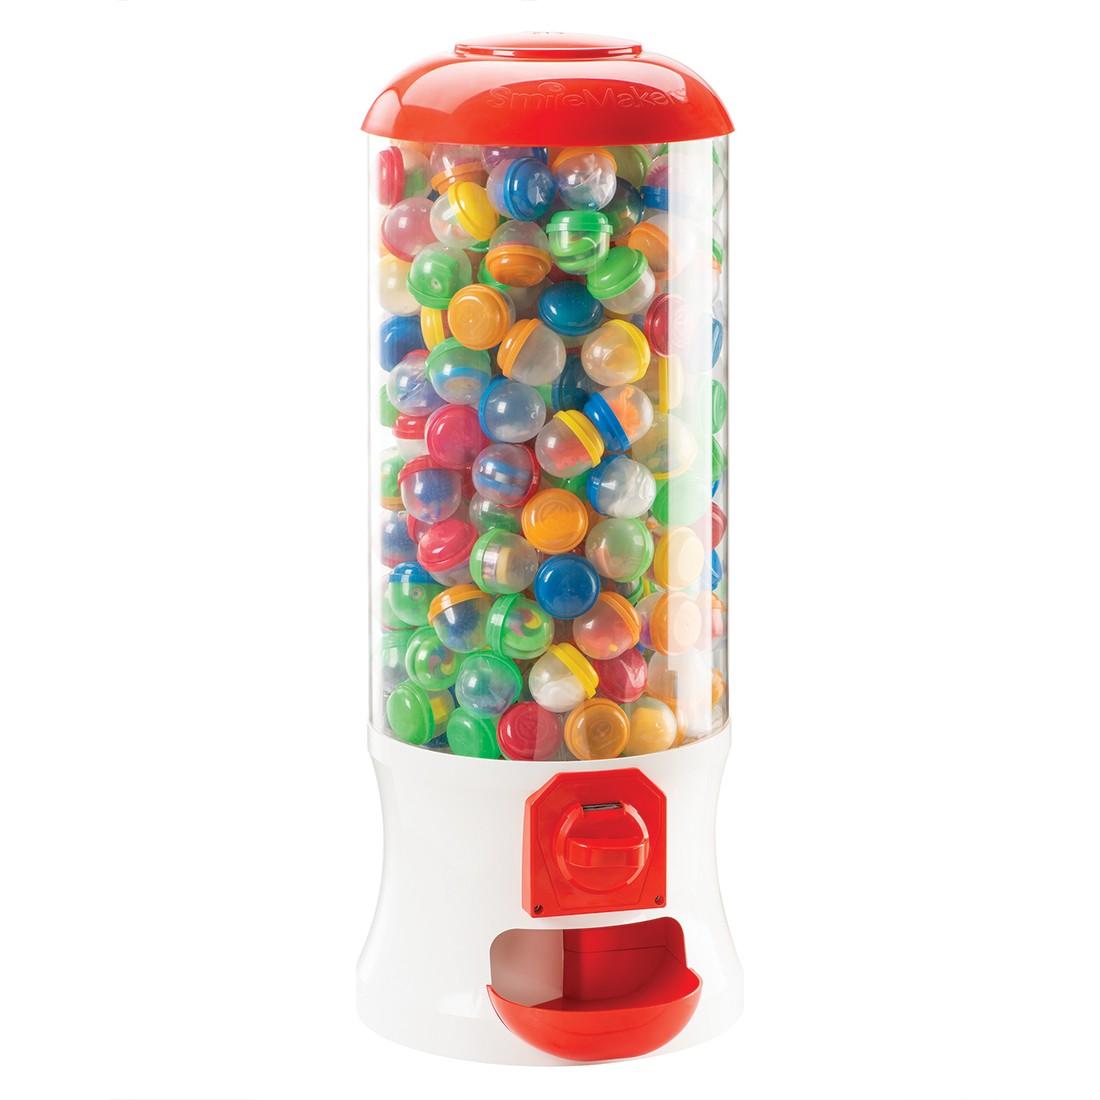 "SmileMakers™ Classic Plus 32"" Toy Vending Machine [image]"